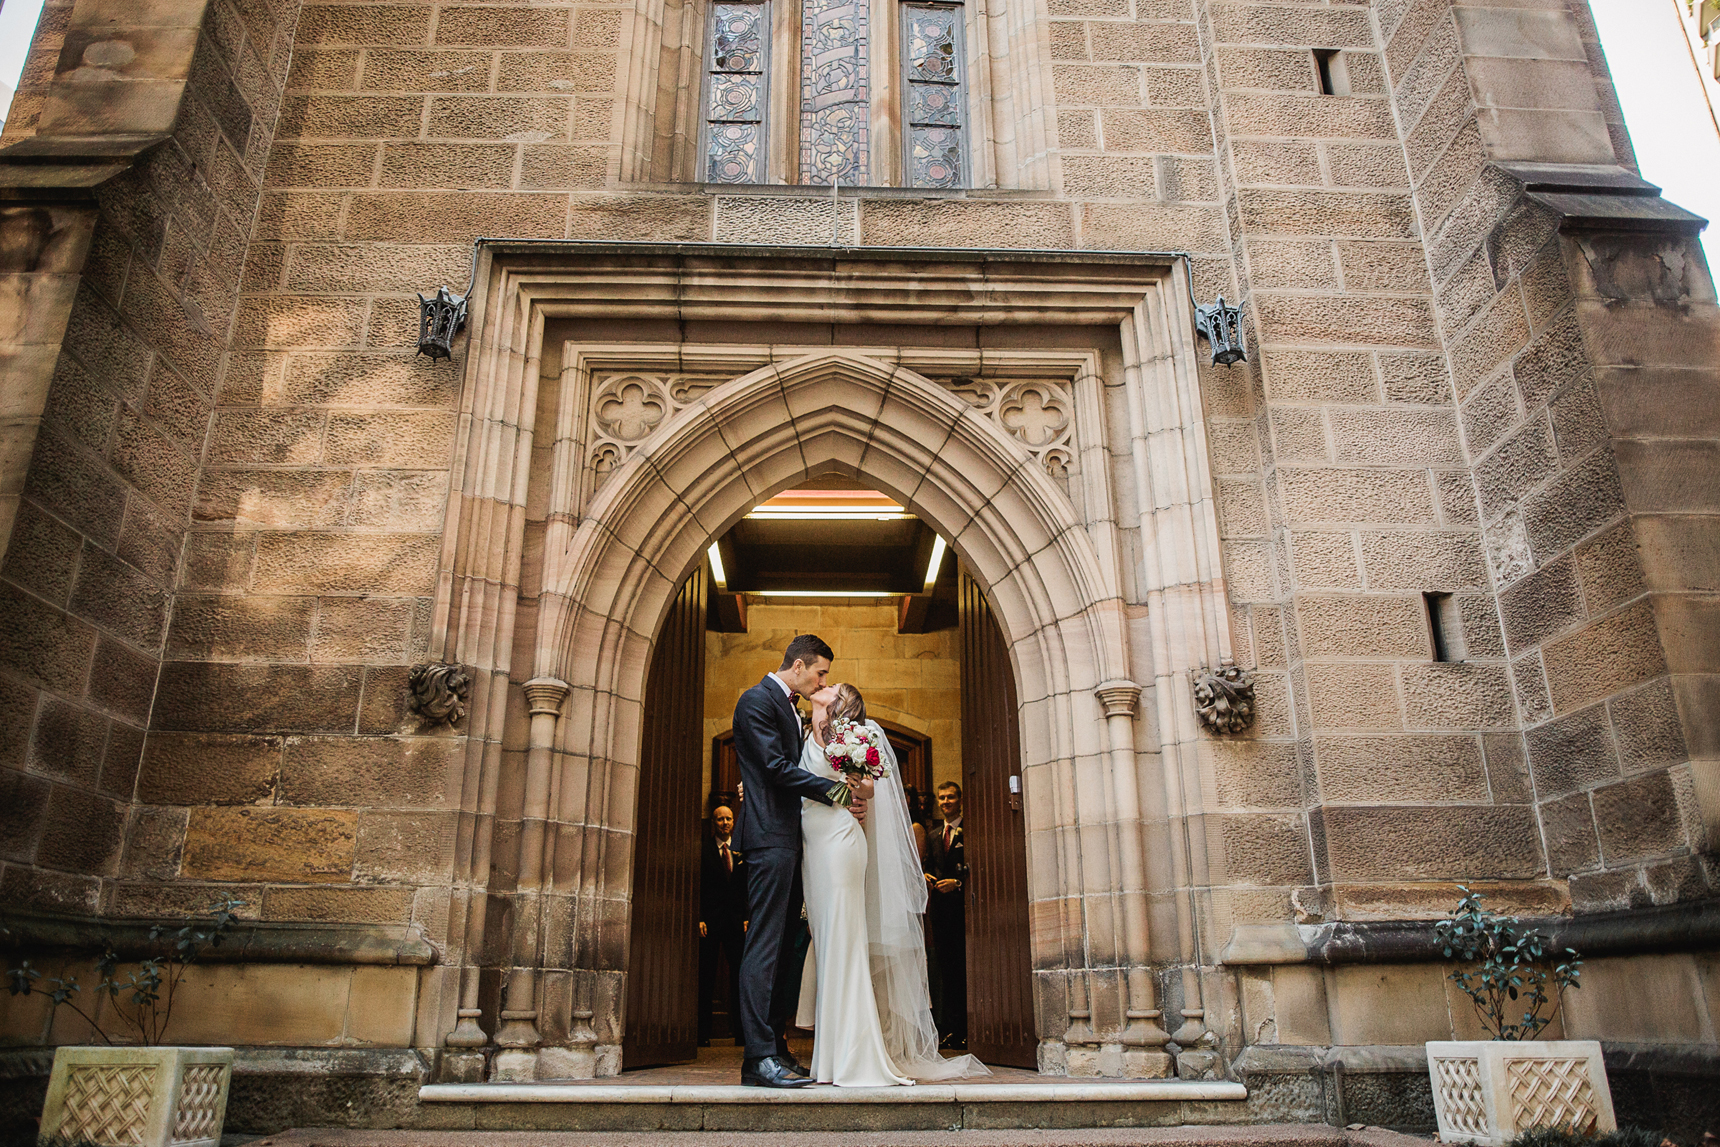 GregLana_ViewBySydney_WeddingPhotography042.jpg